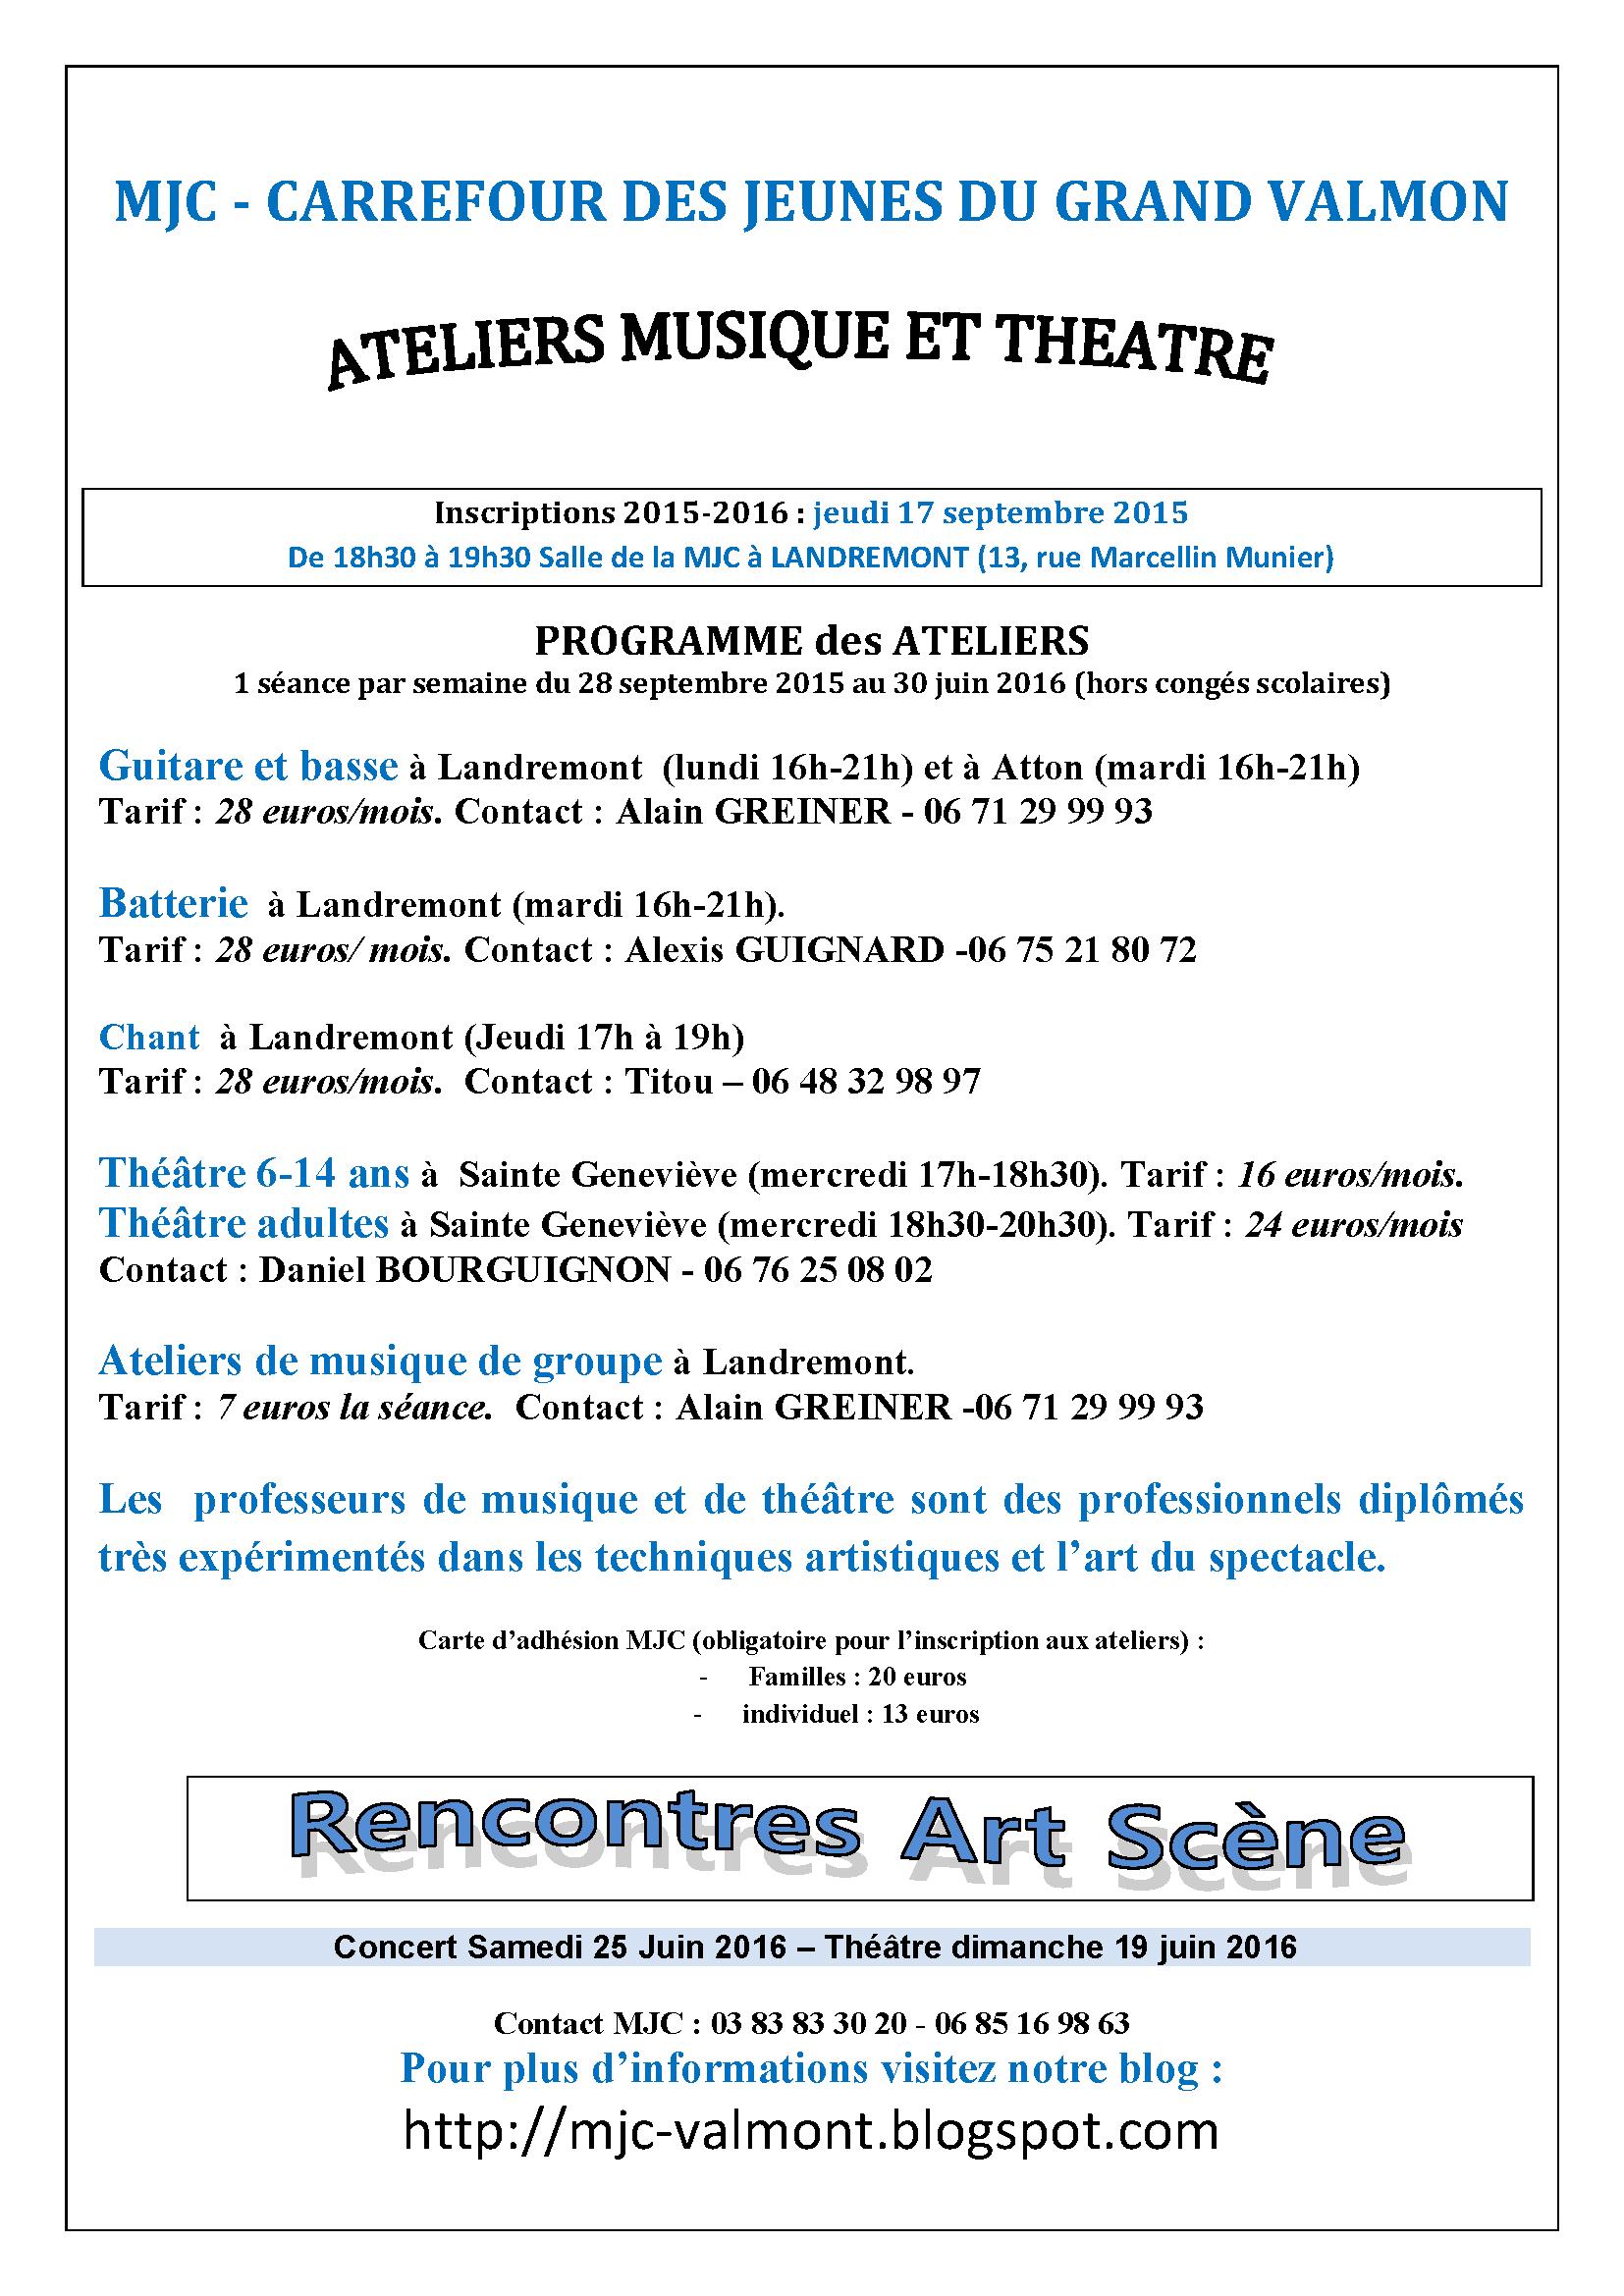 Plaquette Ateliers2015-2016